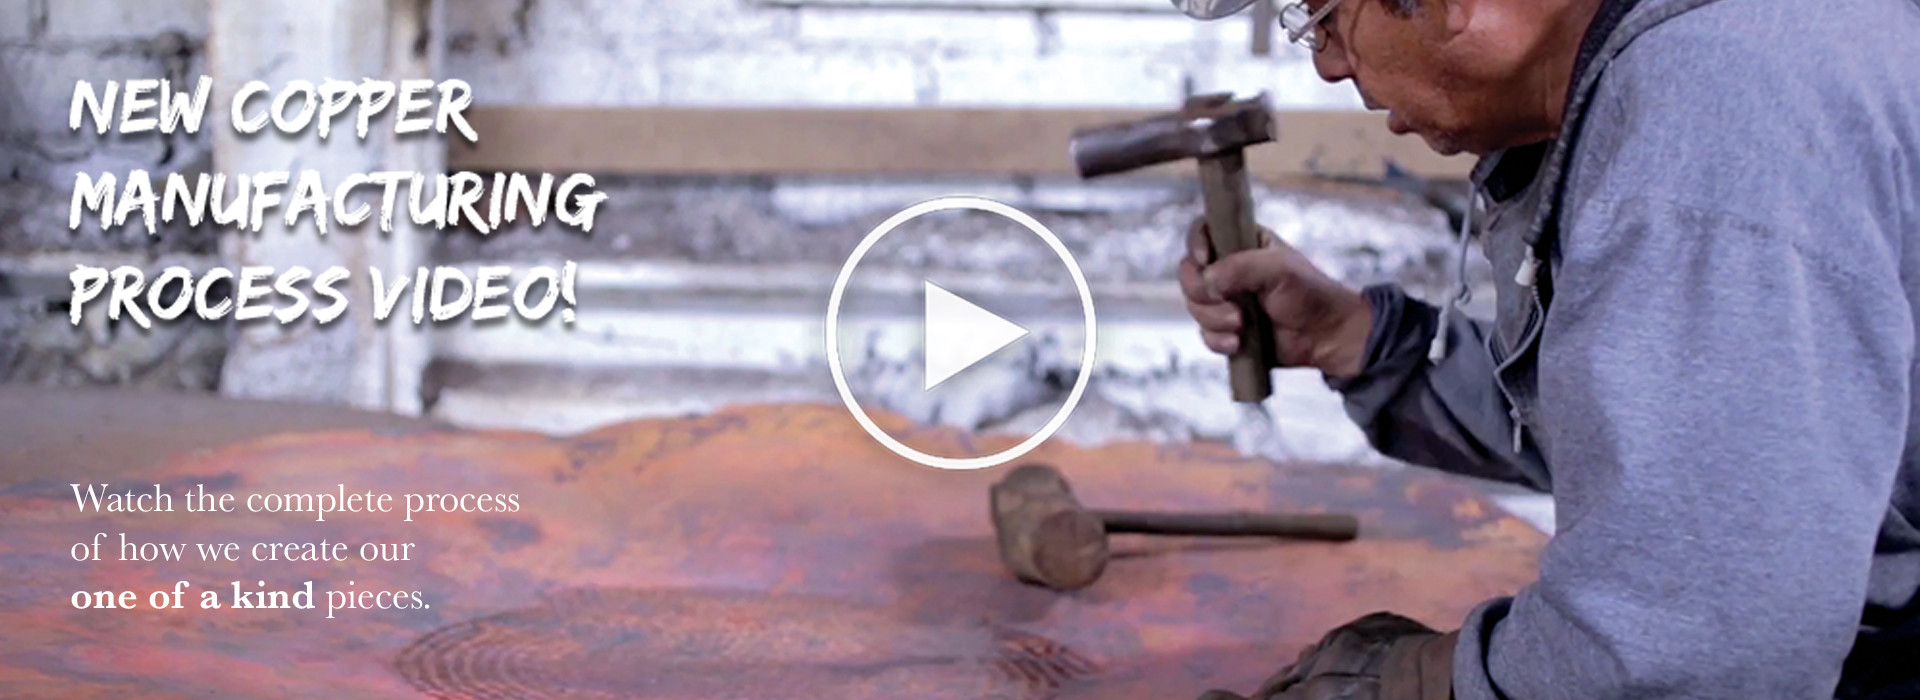 Copper Video